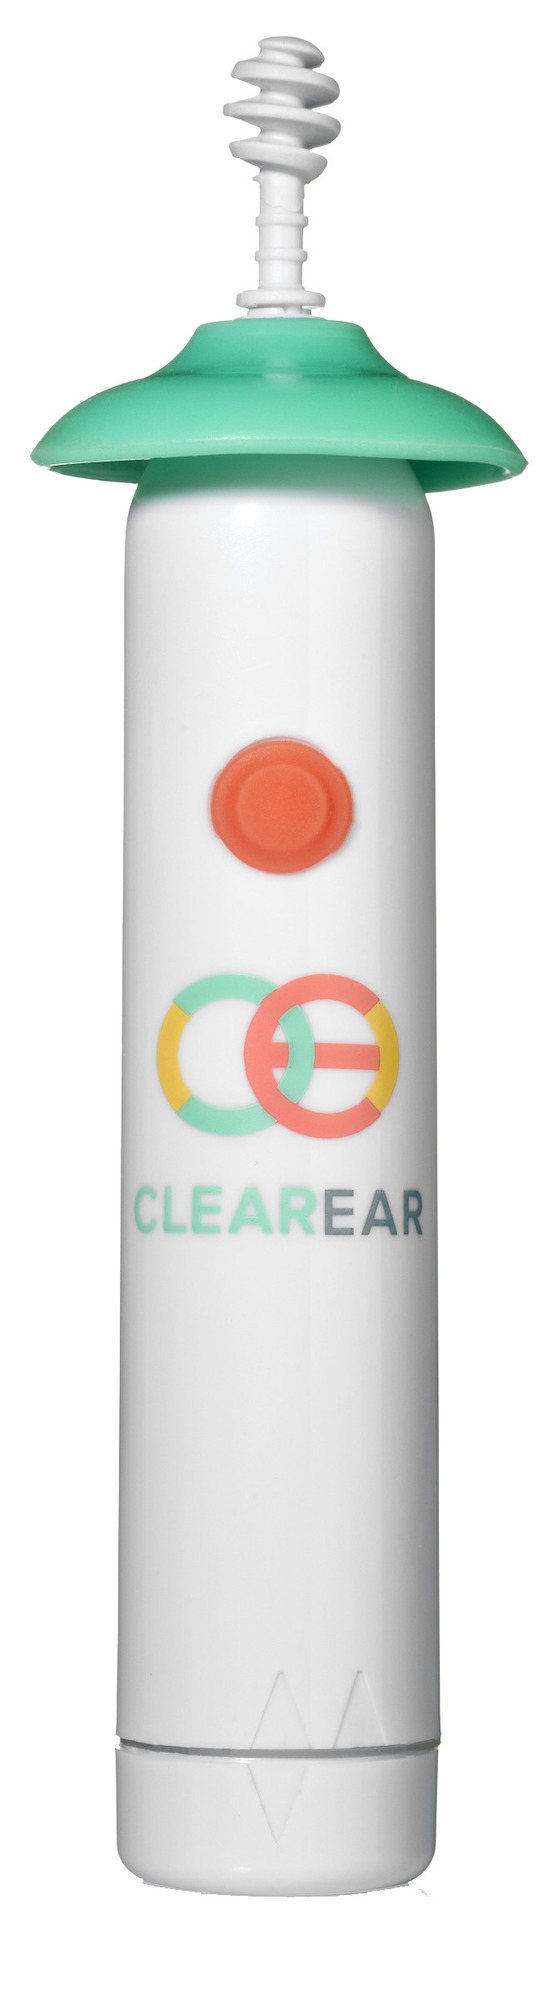 Clear Ear OTO-Tip Soft Spiral Earwax Cleaner